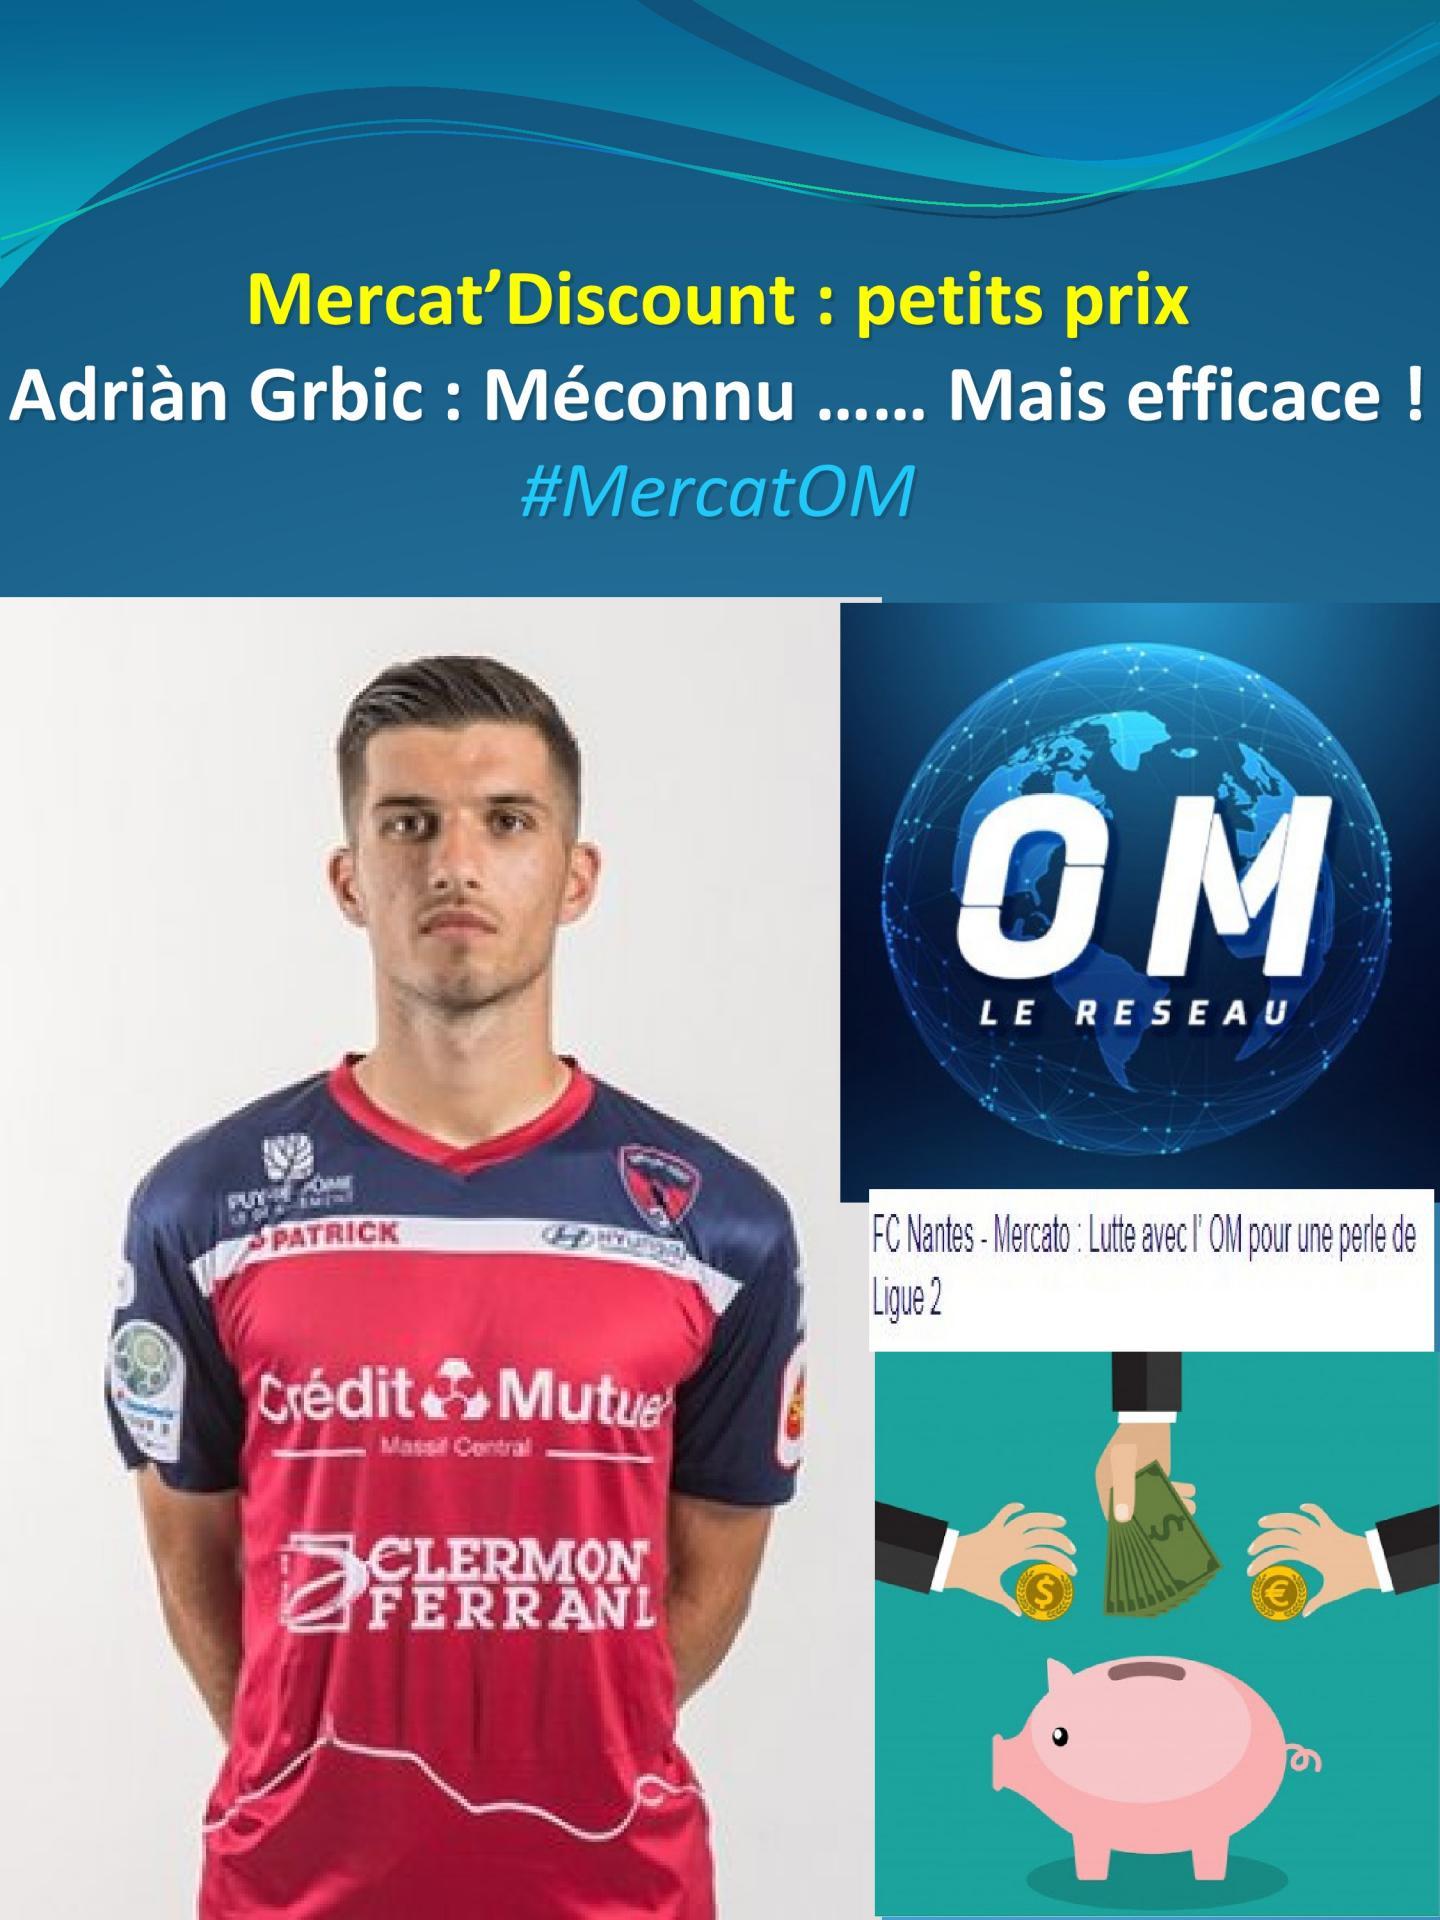 Mercat discount 0